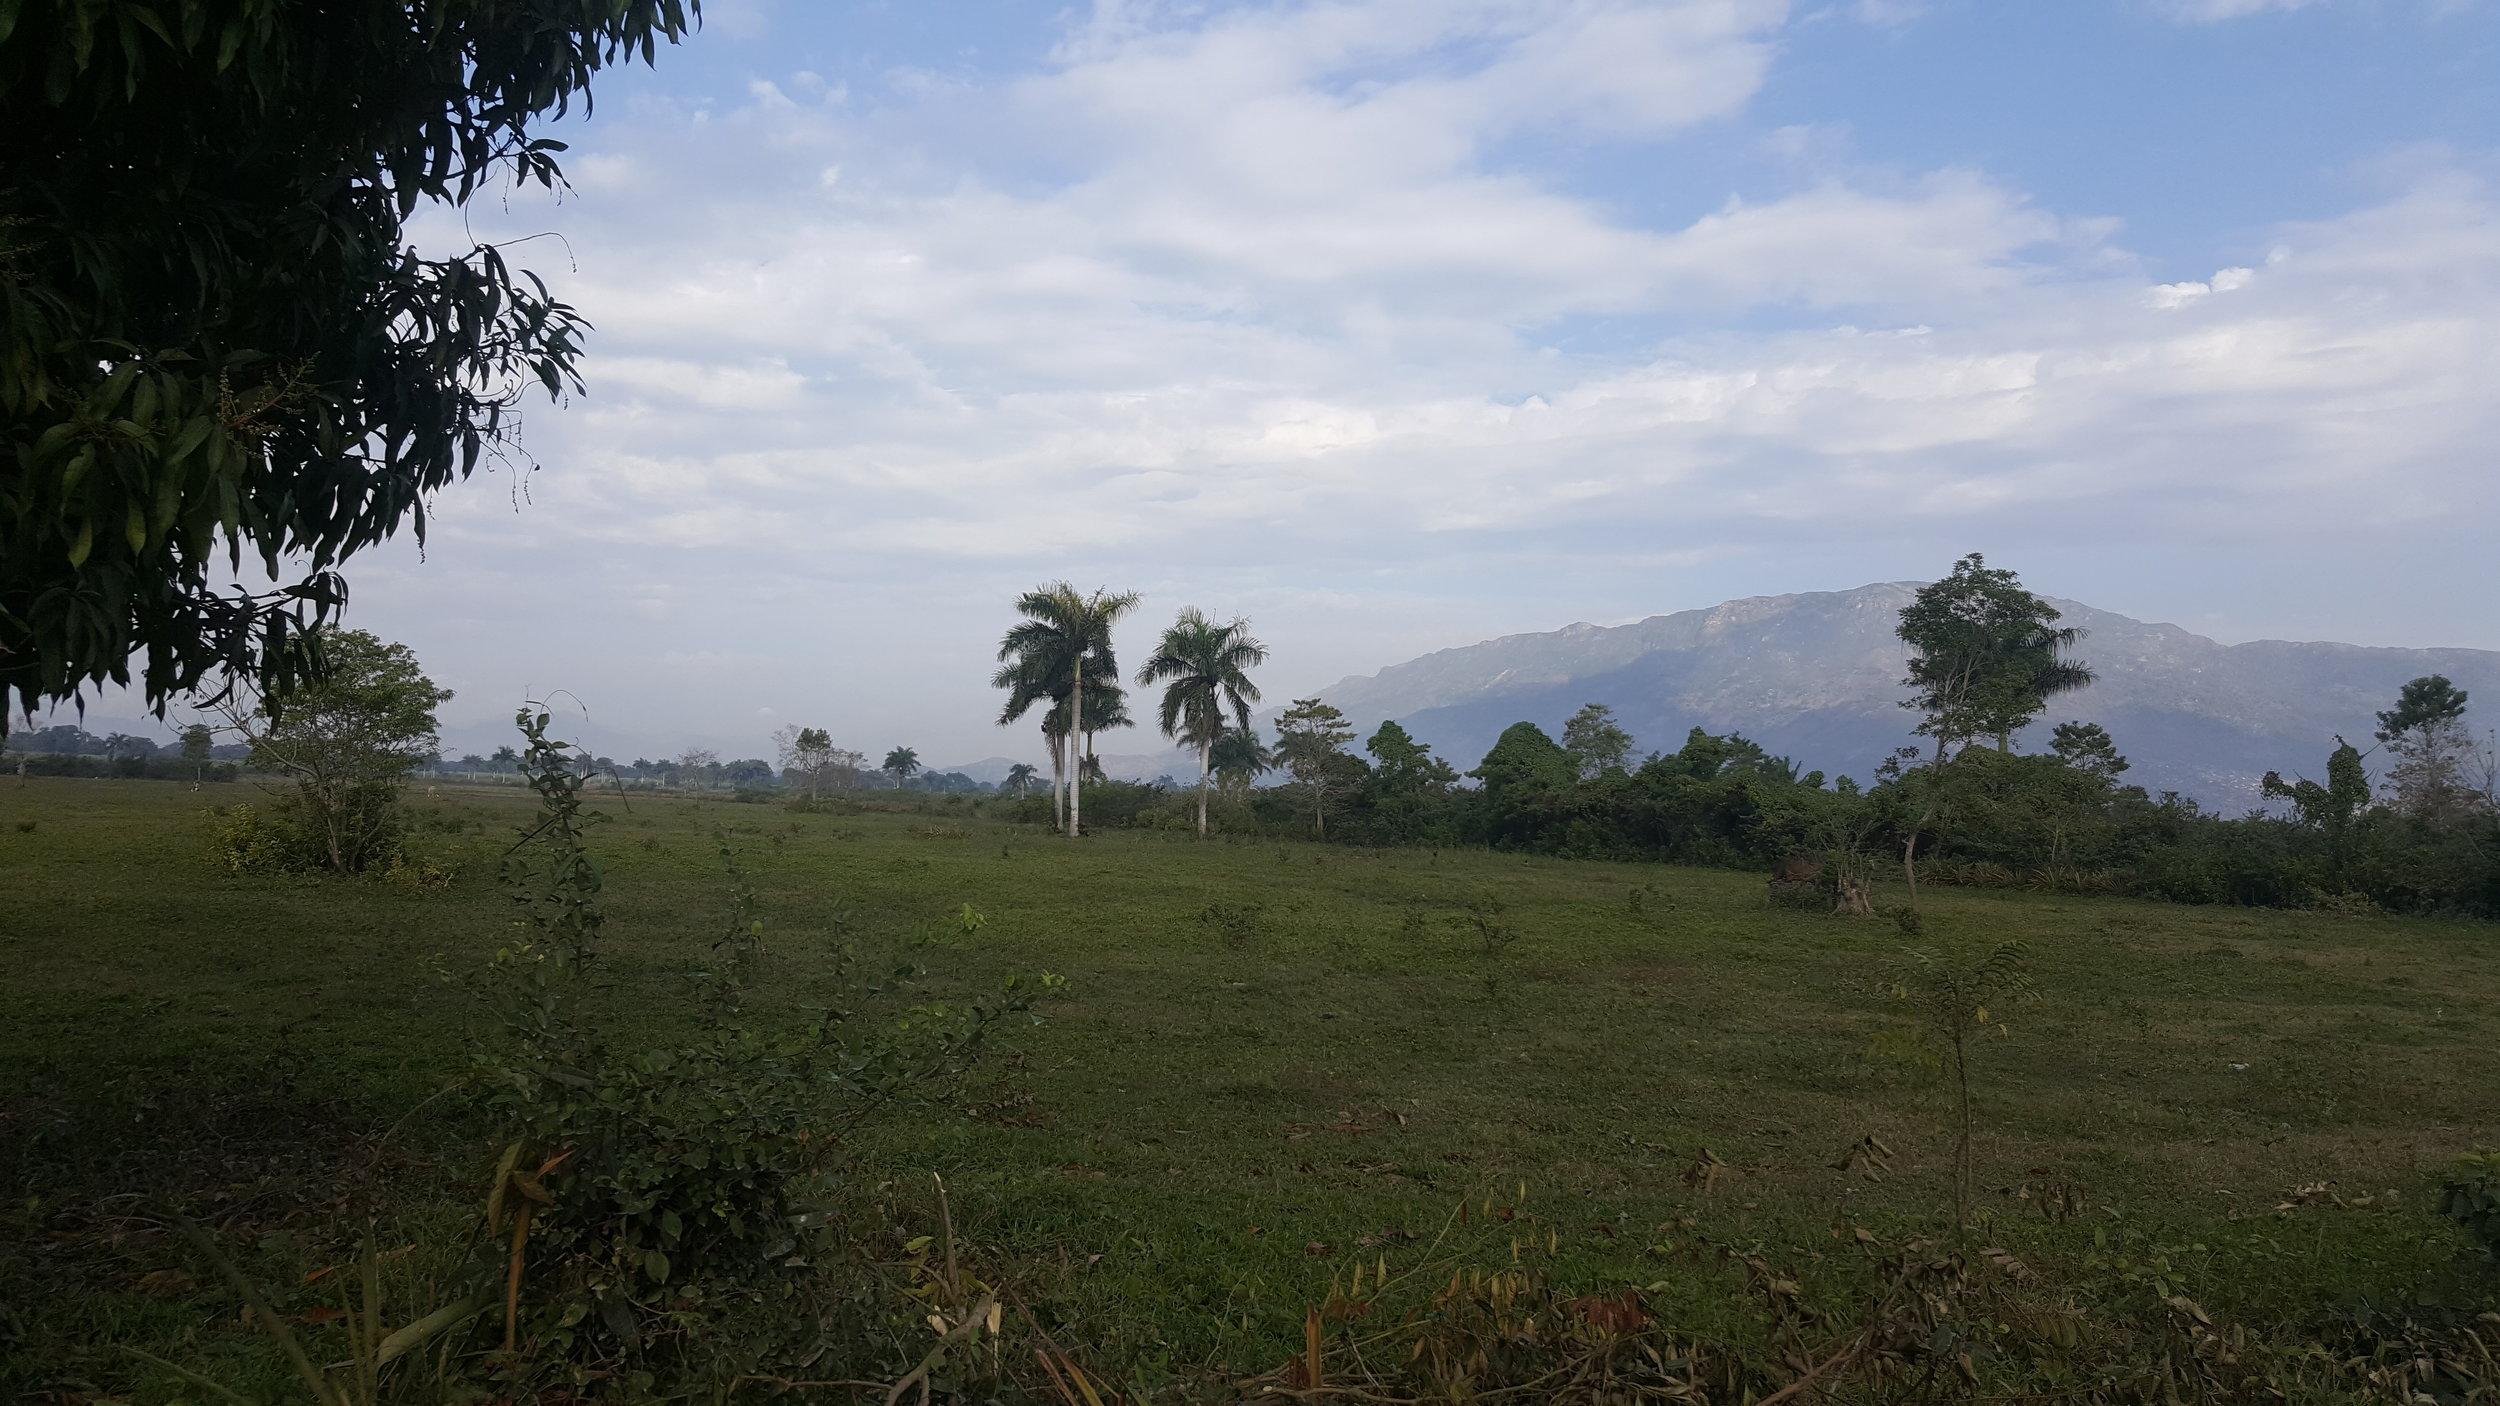 The beautiful scenery of Northern Haiti